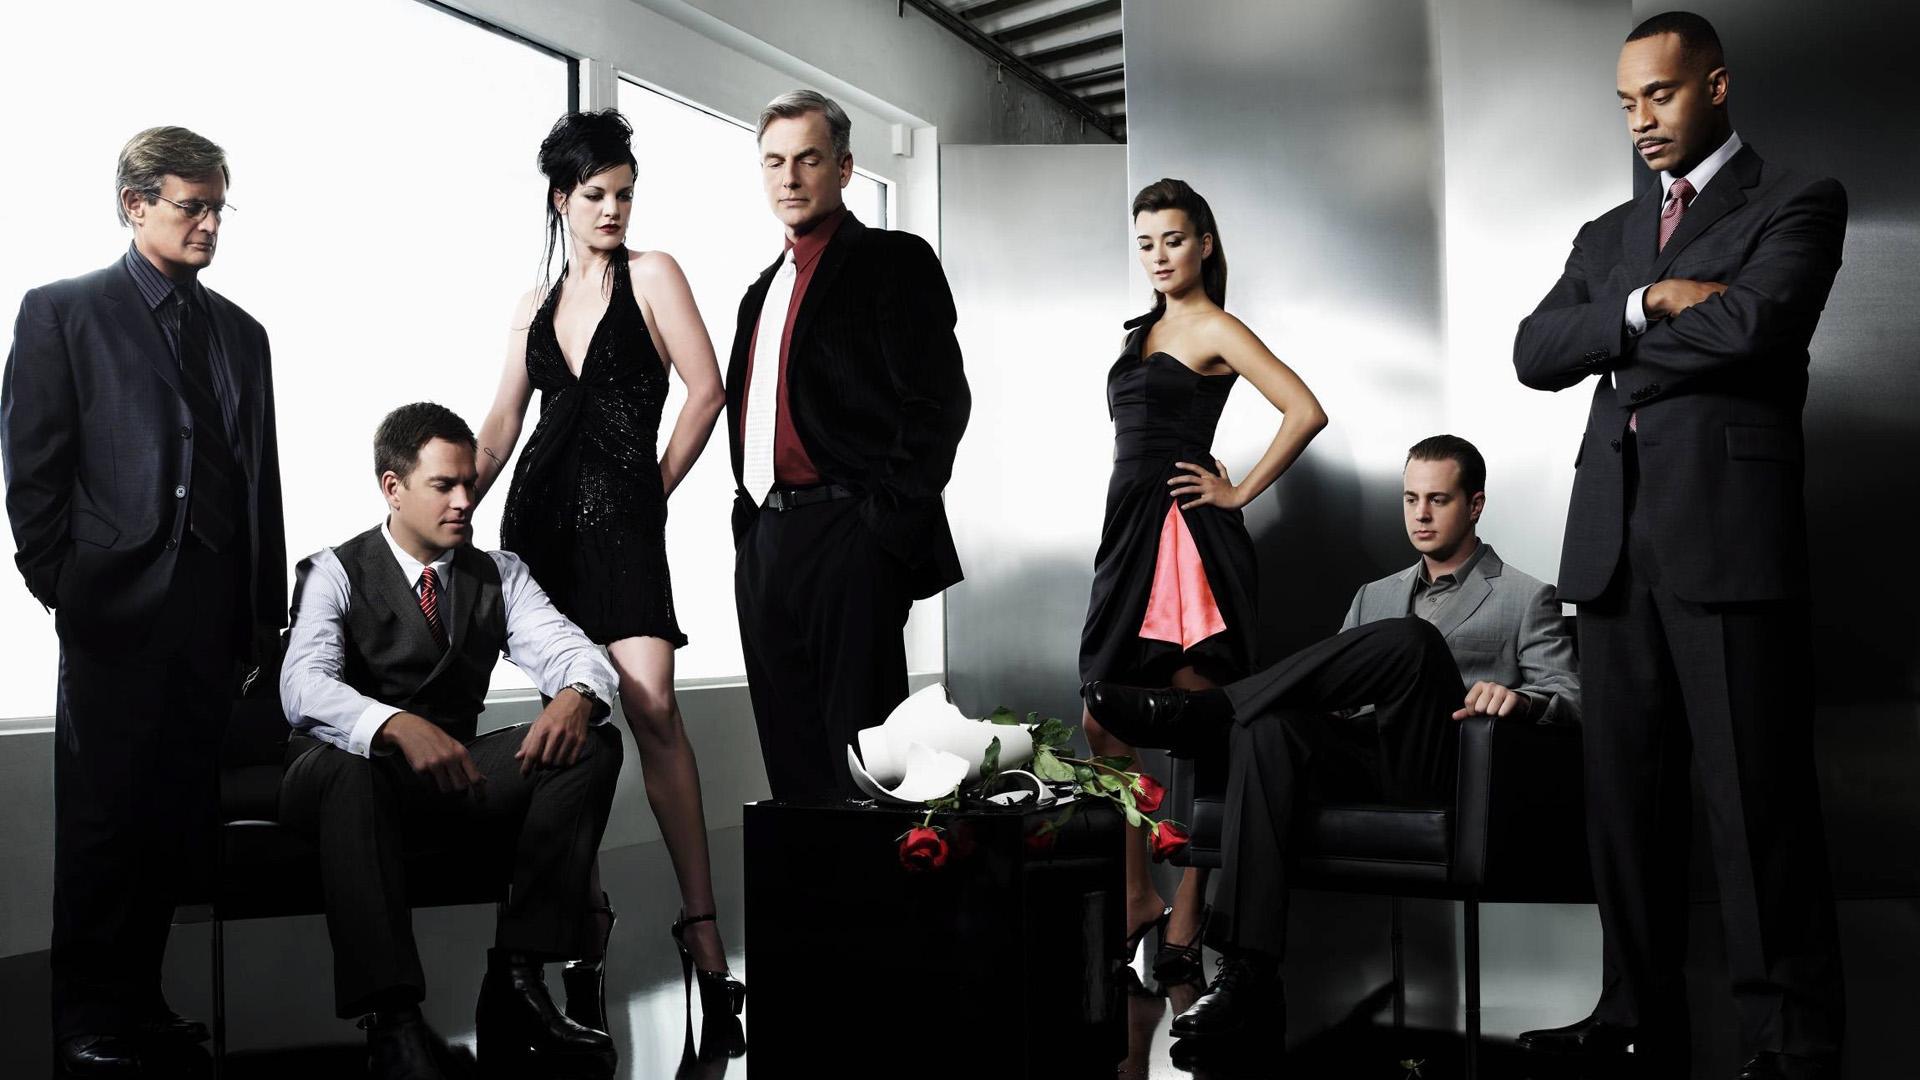 ncis season 6 episode 16 bounce